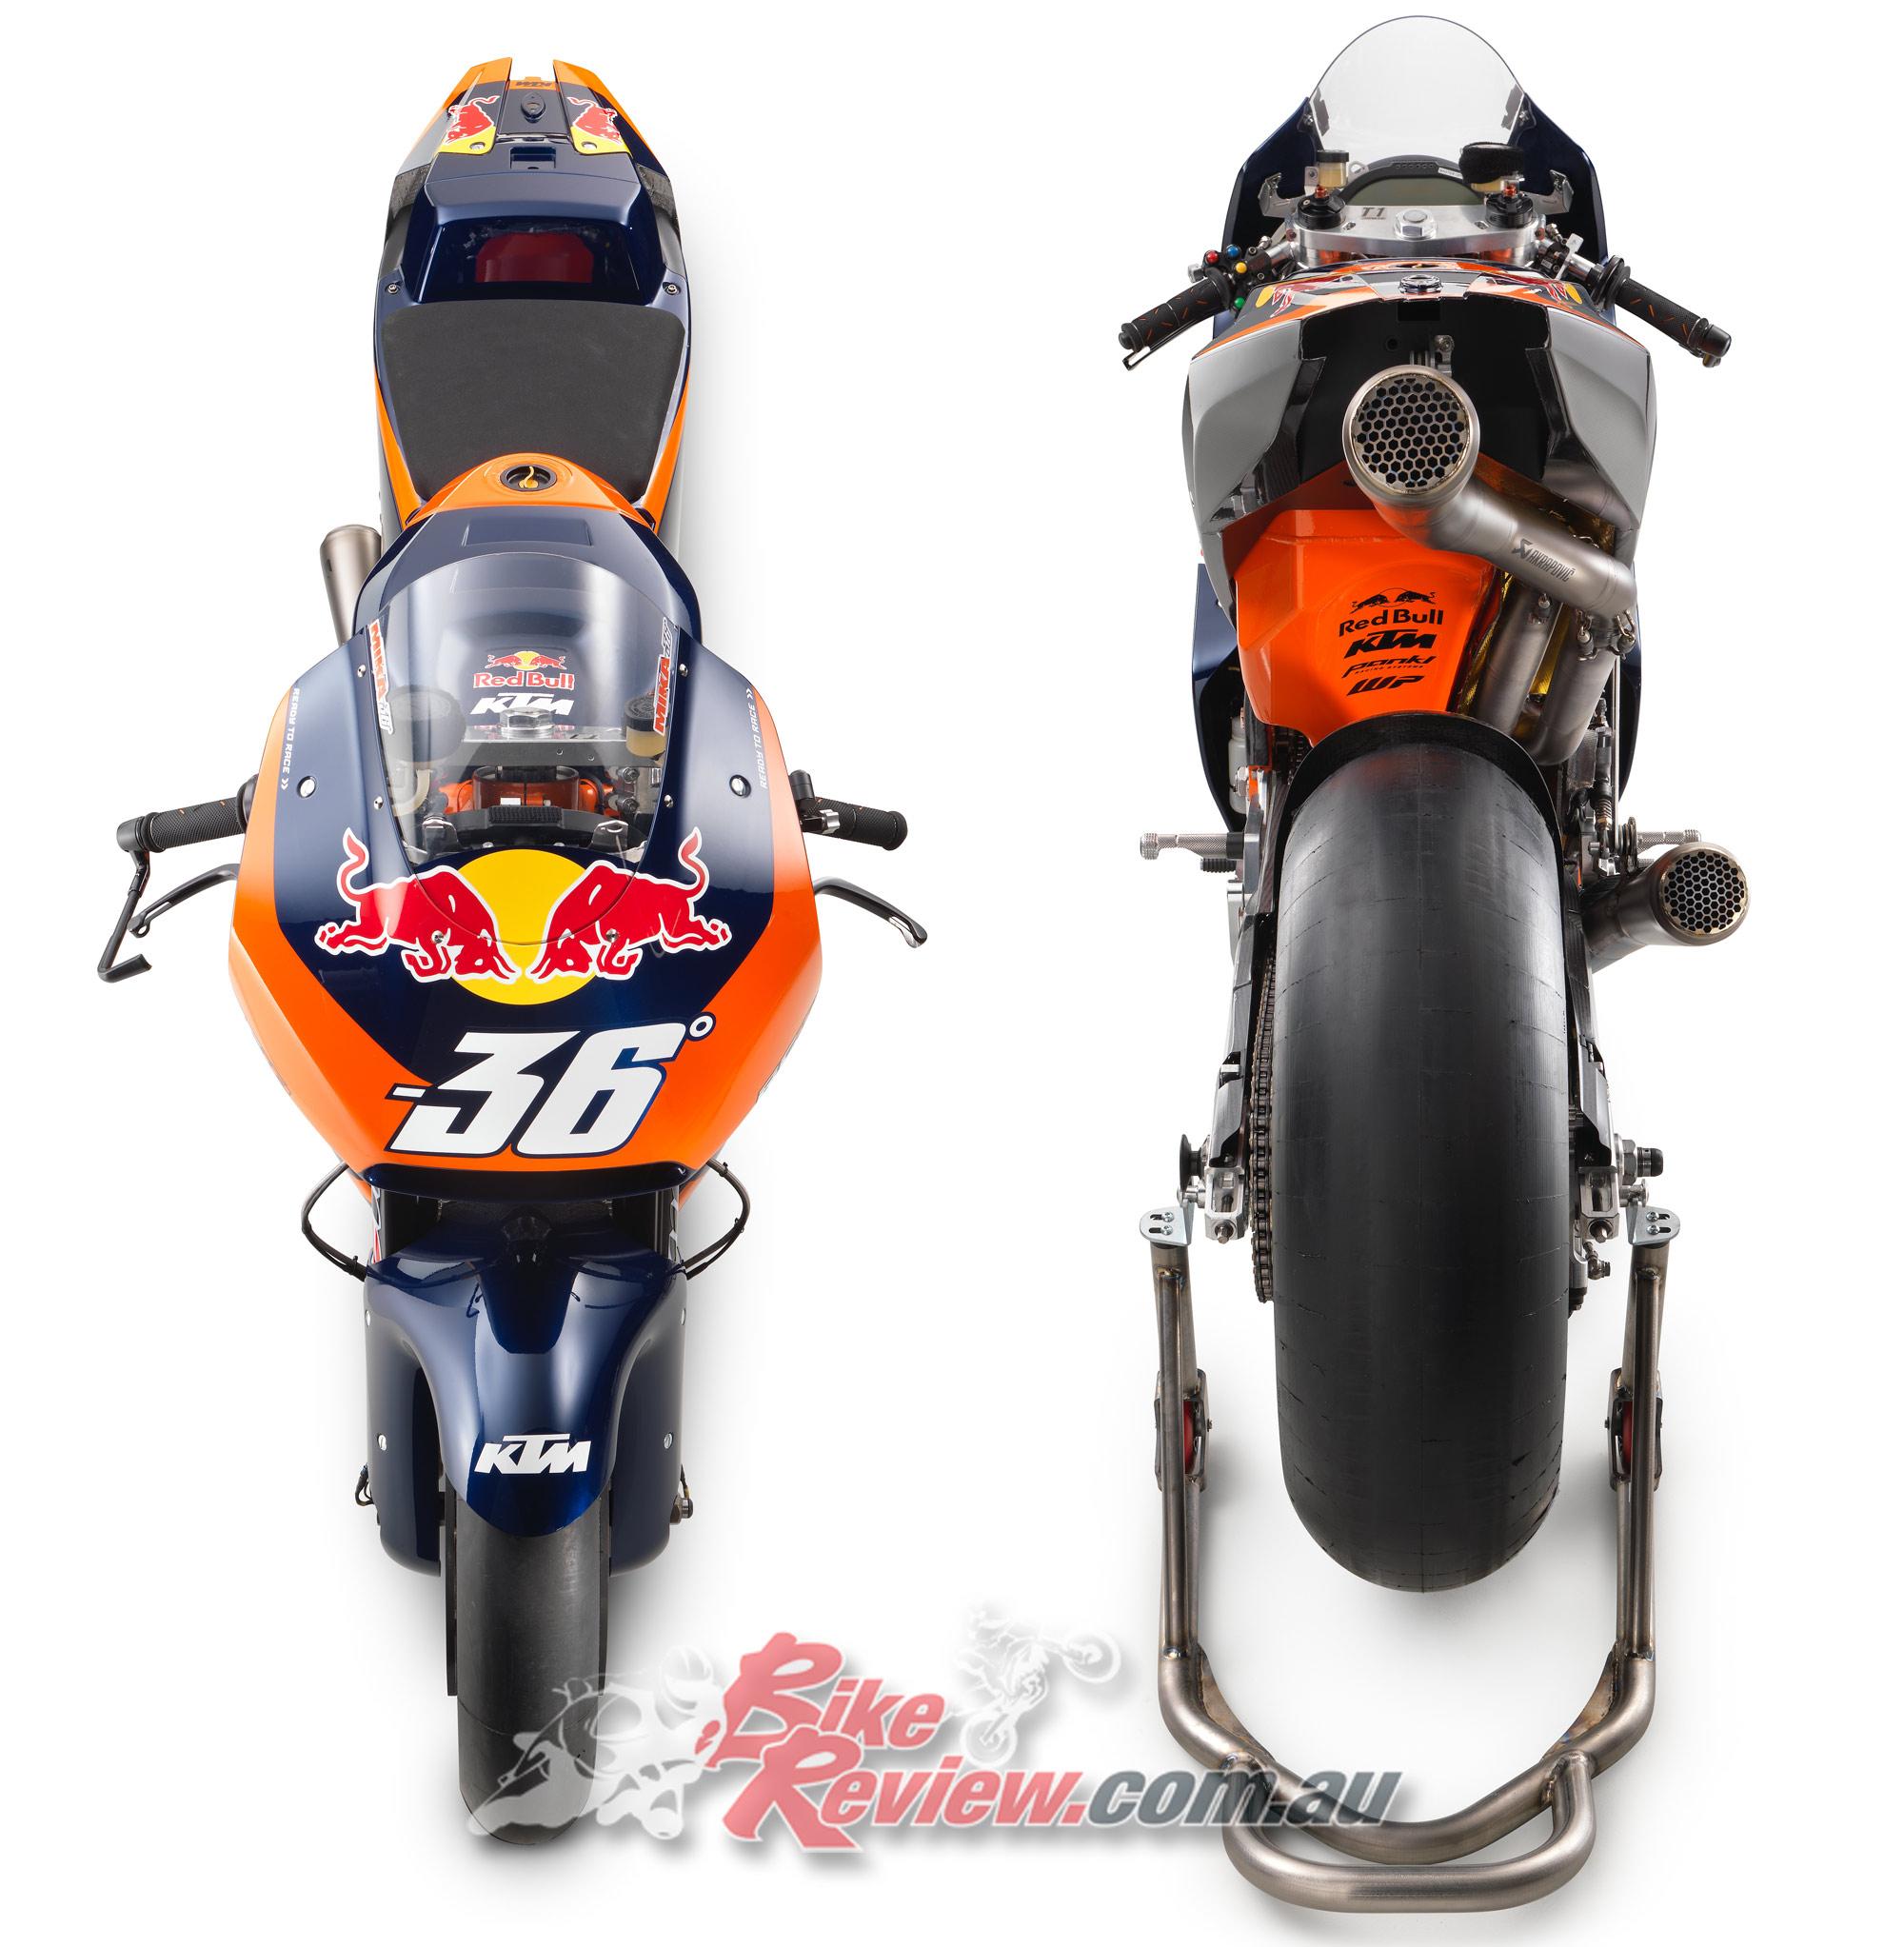 The KTM RC16 MotoGP machine - Bike Review